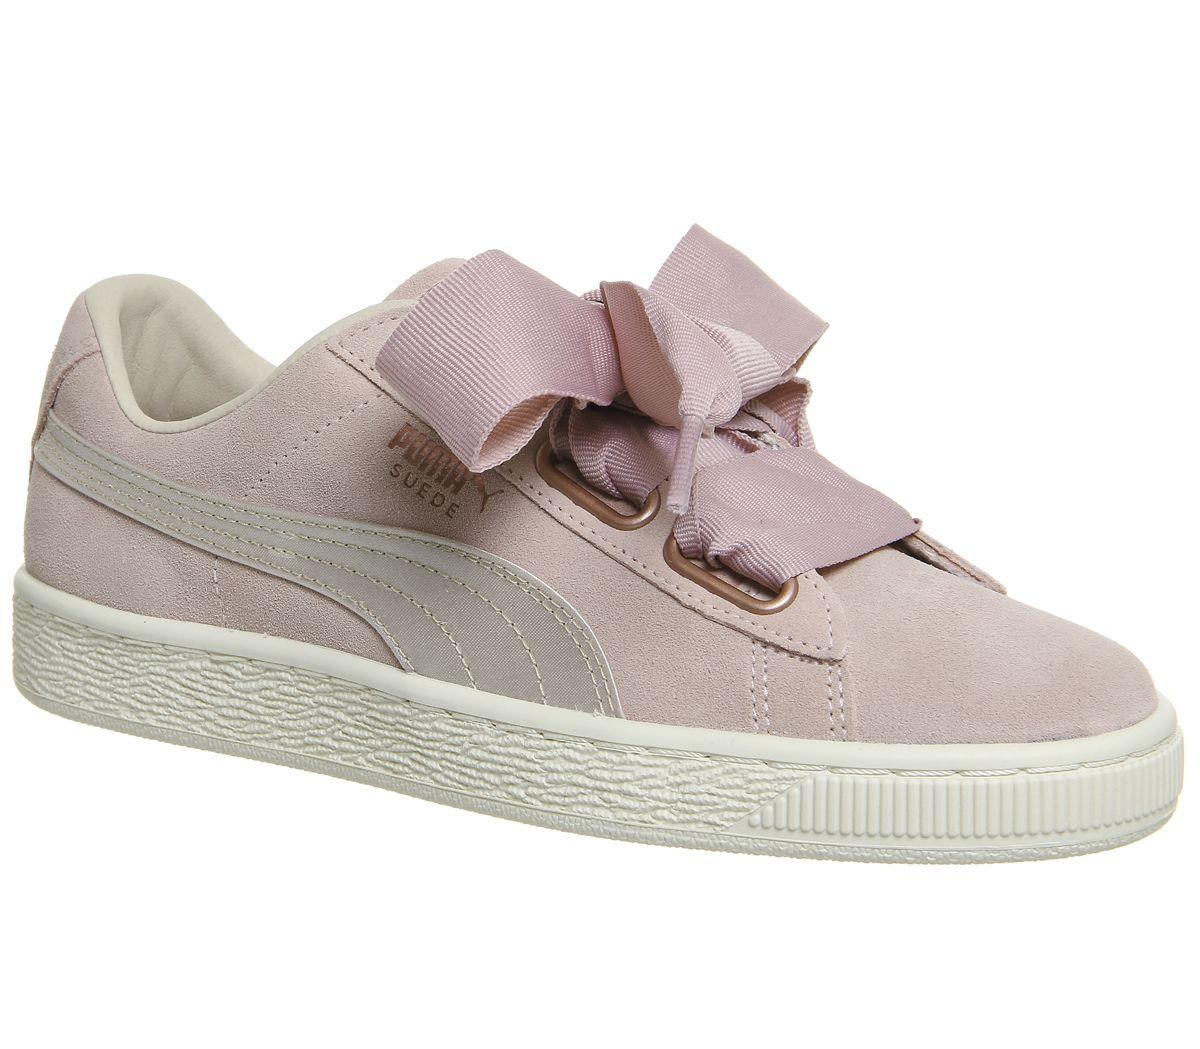 low price sale good quality premium selection Chaussures Femme Puma Daim Coeur Baskets Argent Rose TEINTE OR ...